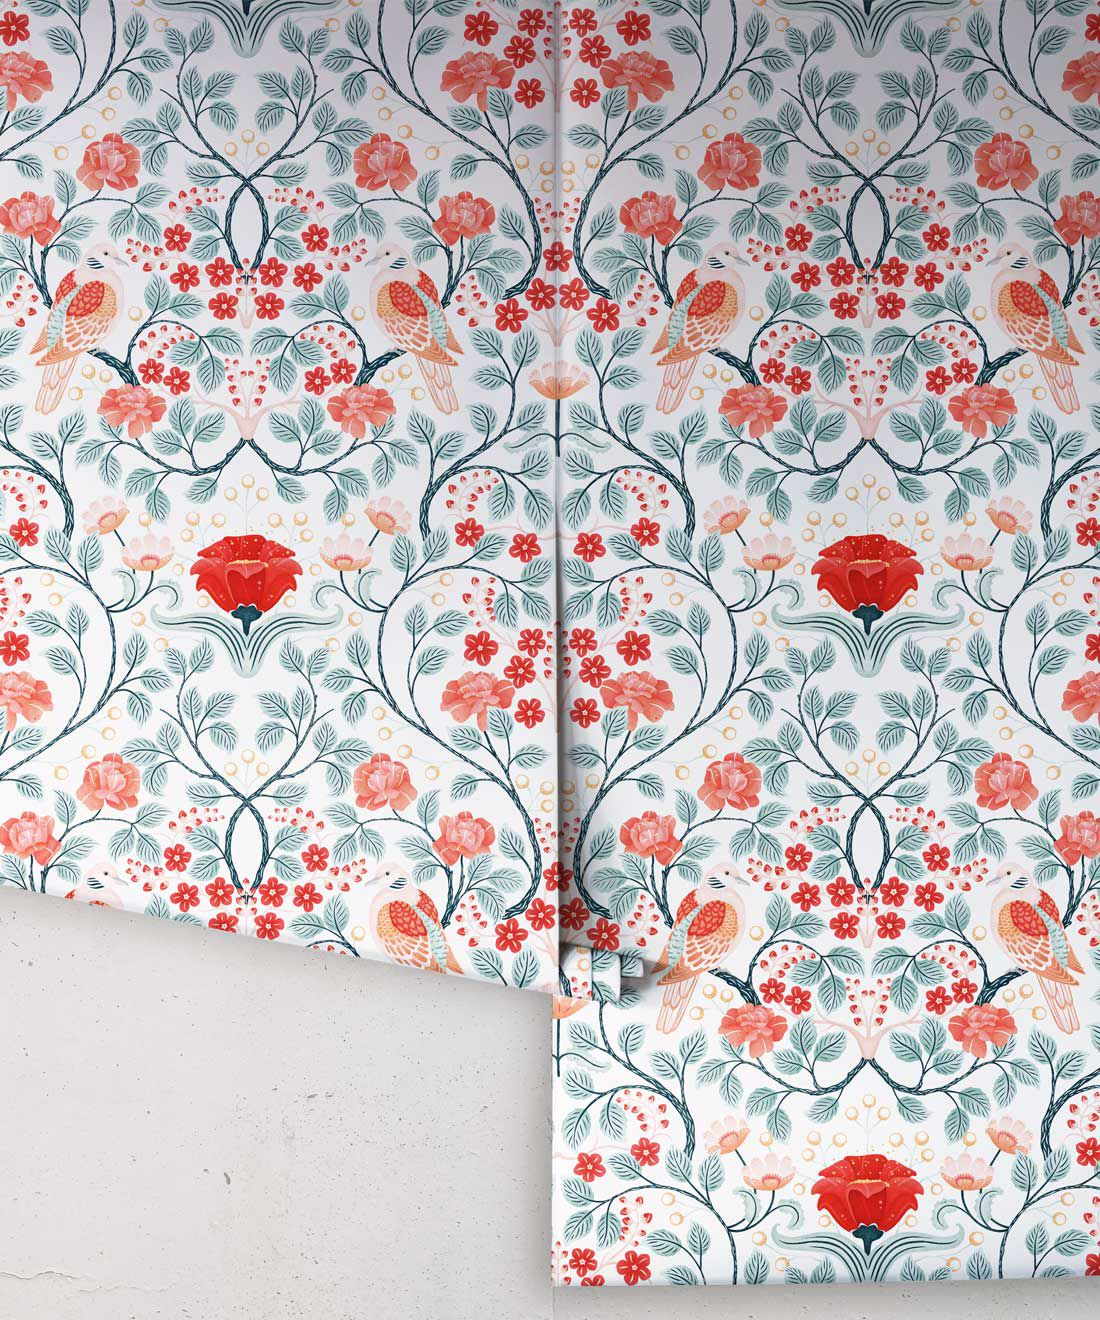 Turtle Doves Wallpaper • Bold Colorful Bird Wallpaper • Peppermint •Rolls